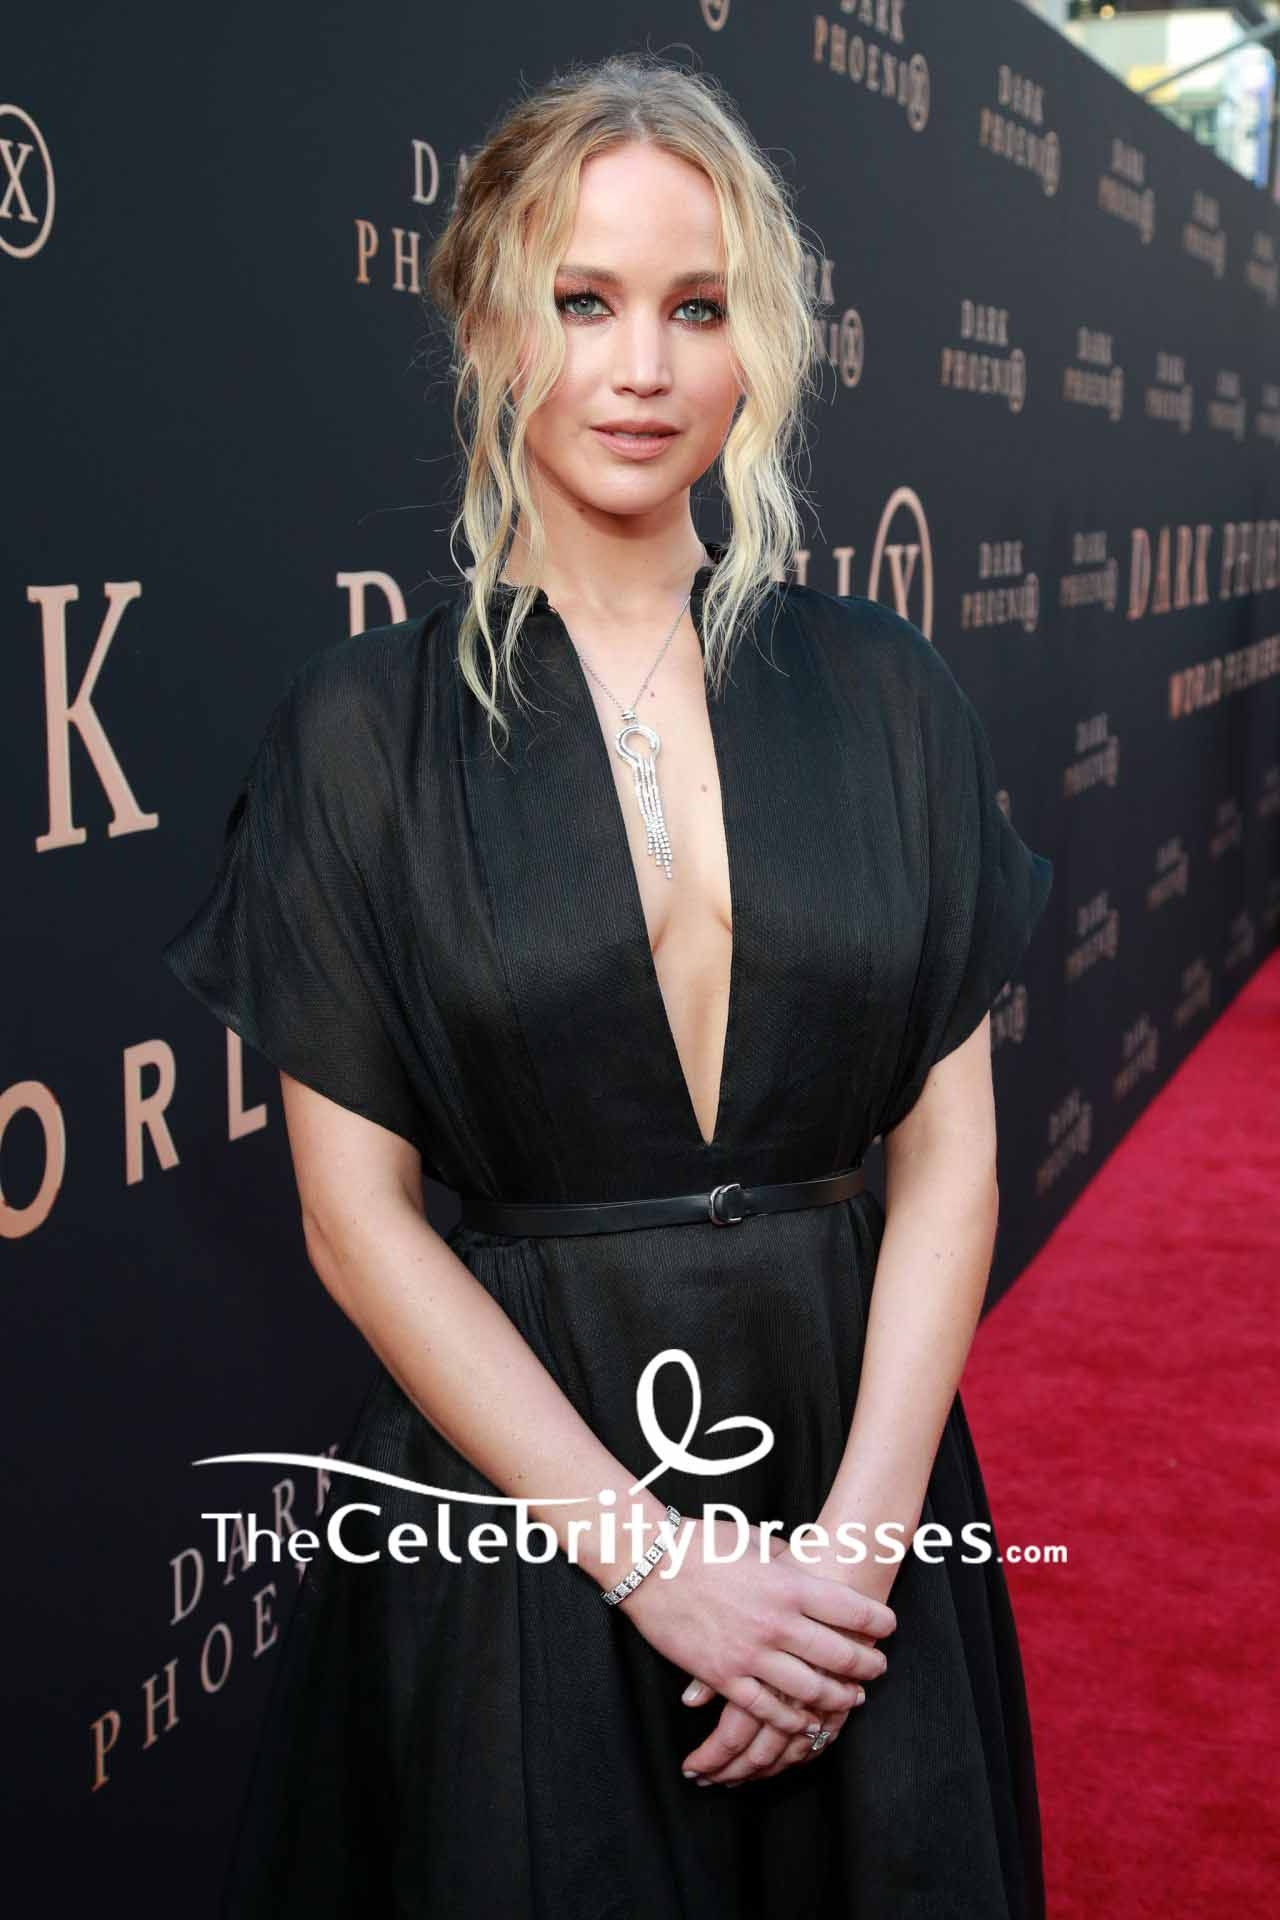 Kate Upton Elegant Black Deep V-neck Formal Dress - Xdressy